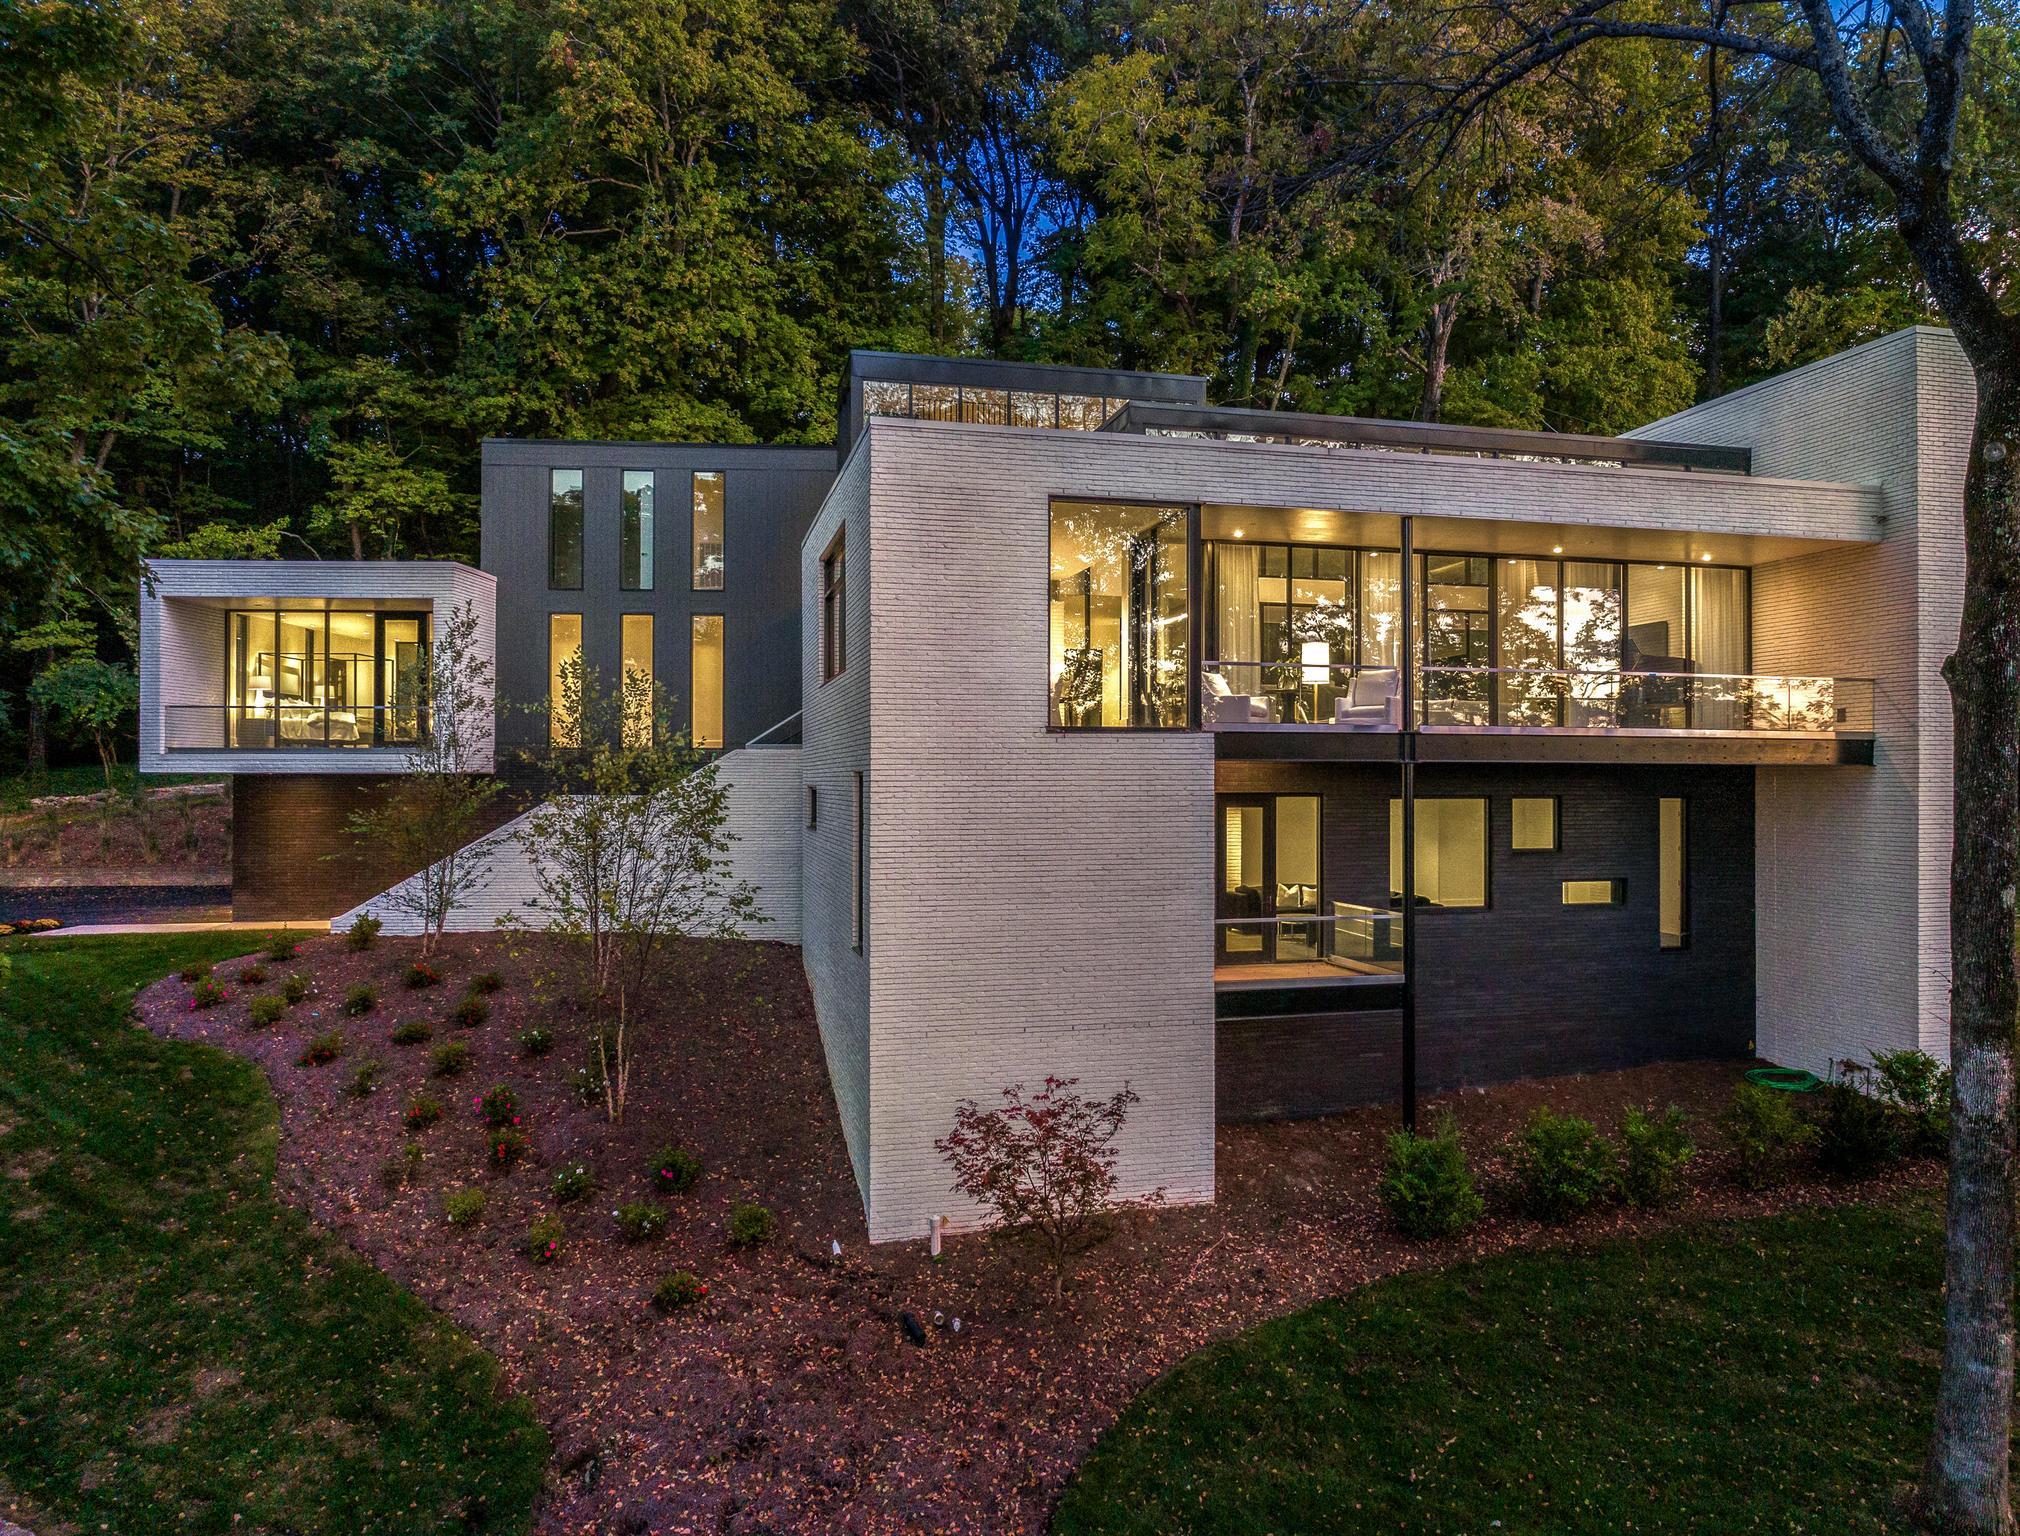 4606 Shys Hill Rd, Nashville, TN 37215 - Nashville, TN real estate listing